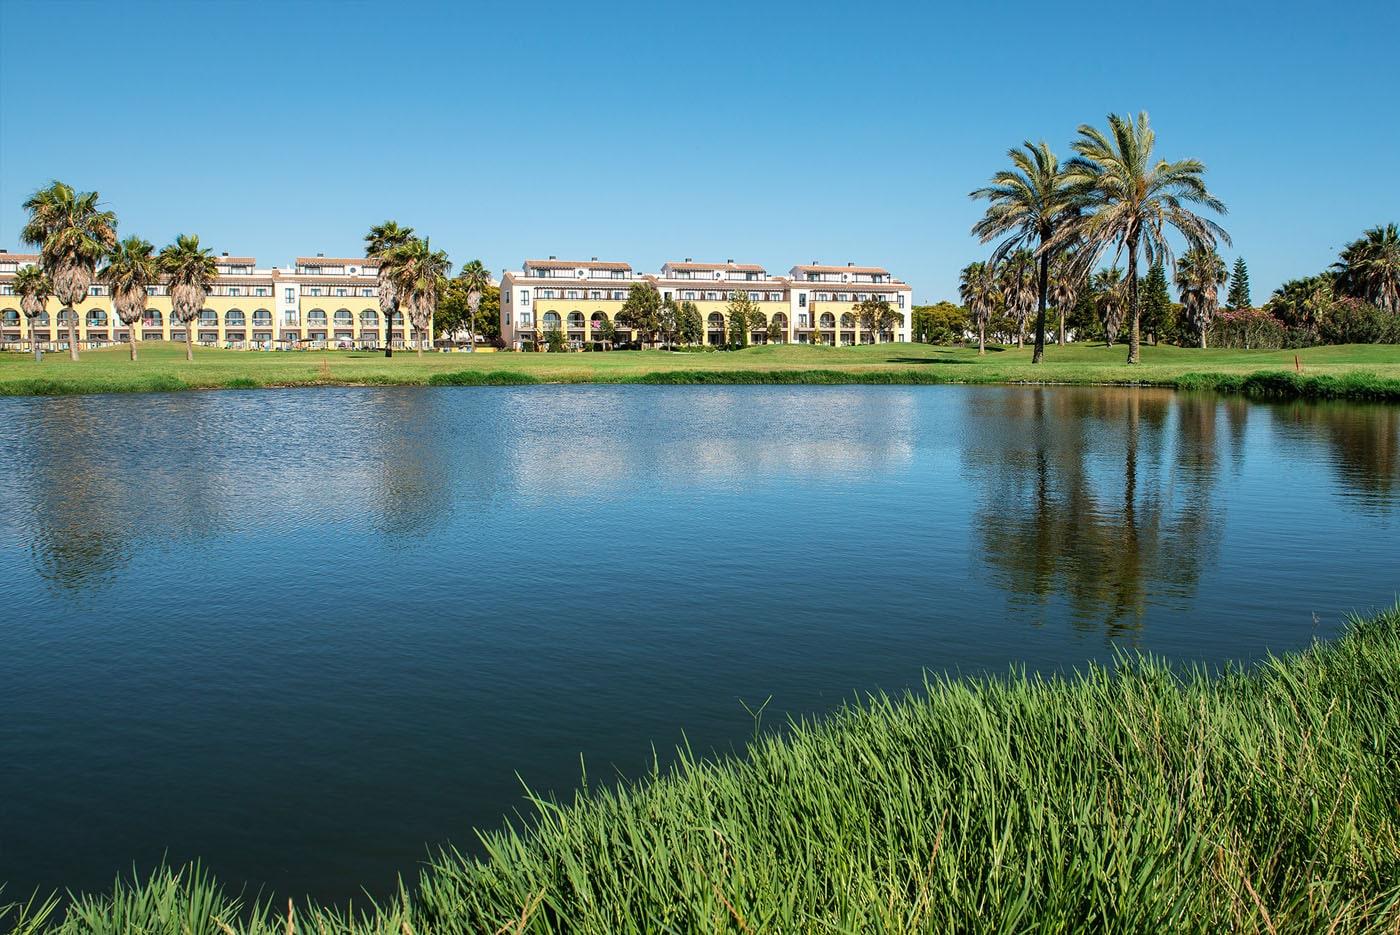 hotel-barcelo-costa-ballena-adolfo-gosalvez-hoteles-panoramicos